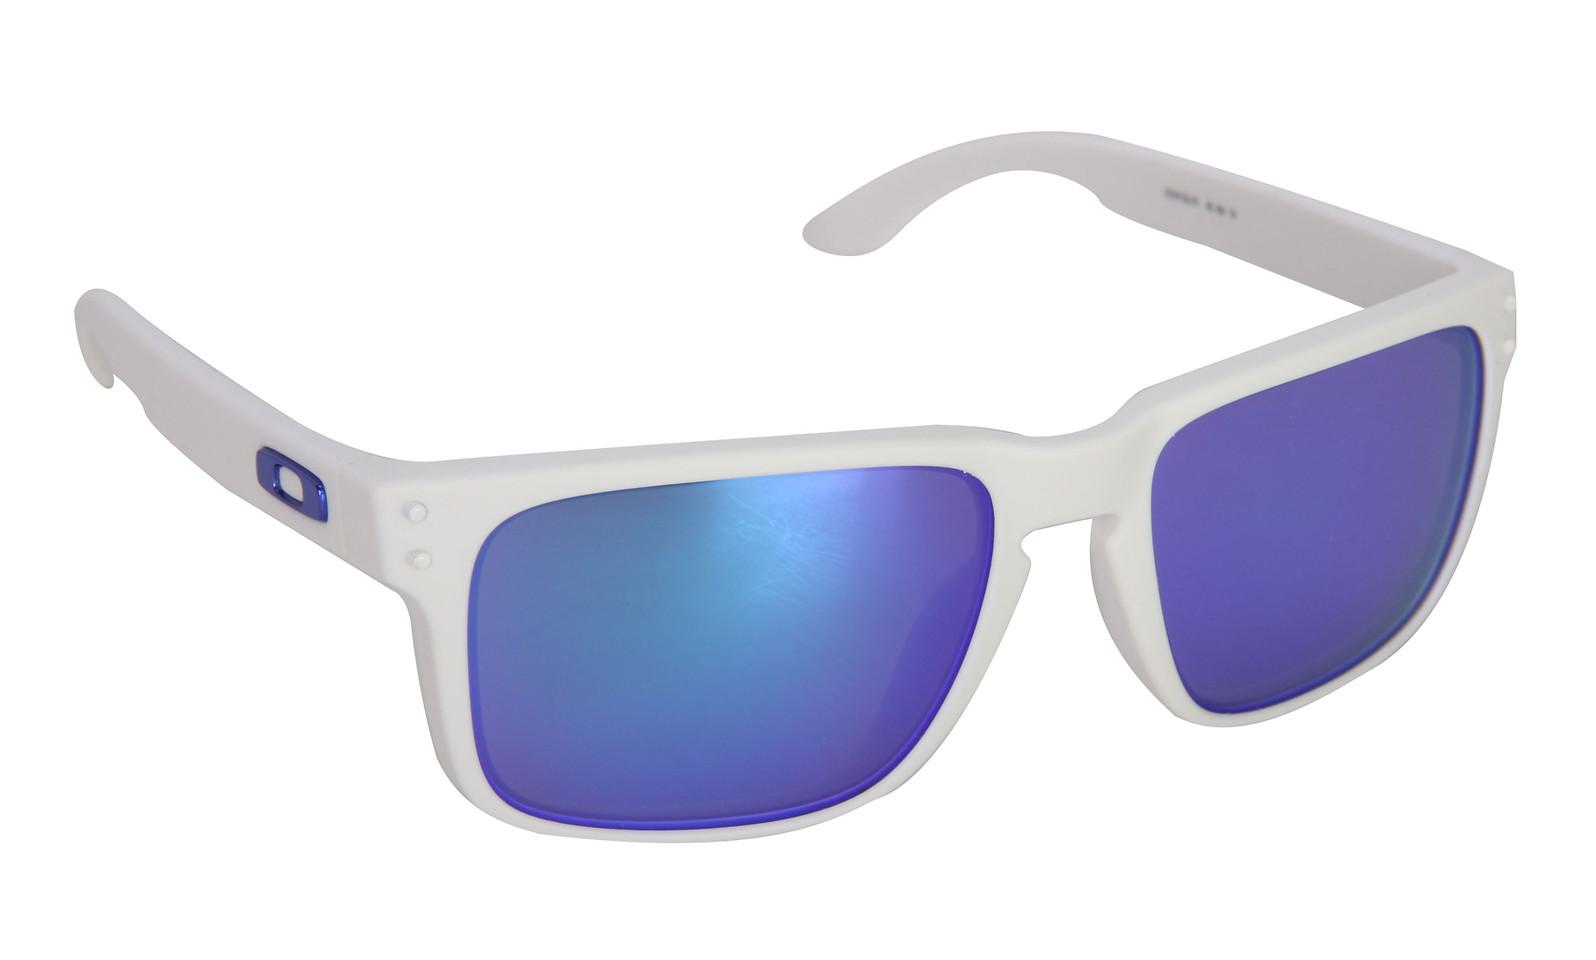 157214554ee1a australia oakley holbrook sunglasses purple lenses 88c6f d8cdf